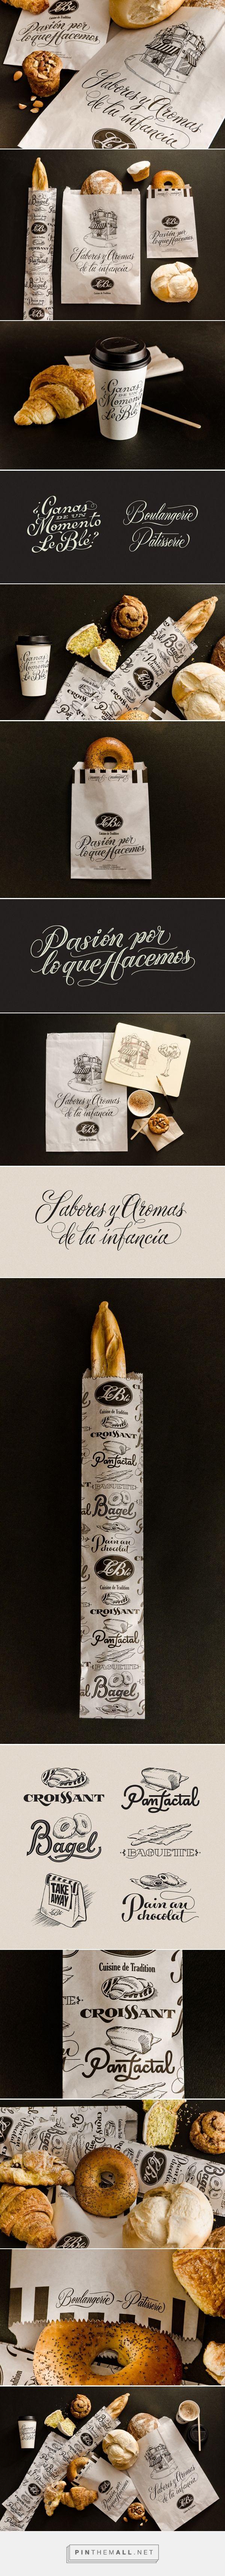 Le Blé Deli Restaurant The Work of Yani Arabena & Guille Vizzari Calligraphy, Lettering, design and Illustration.